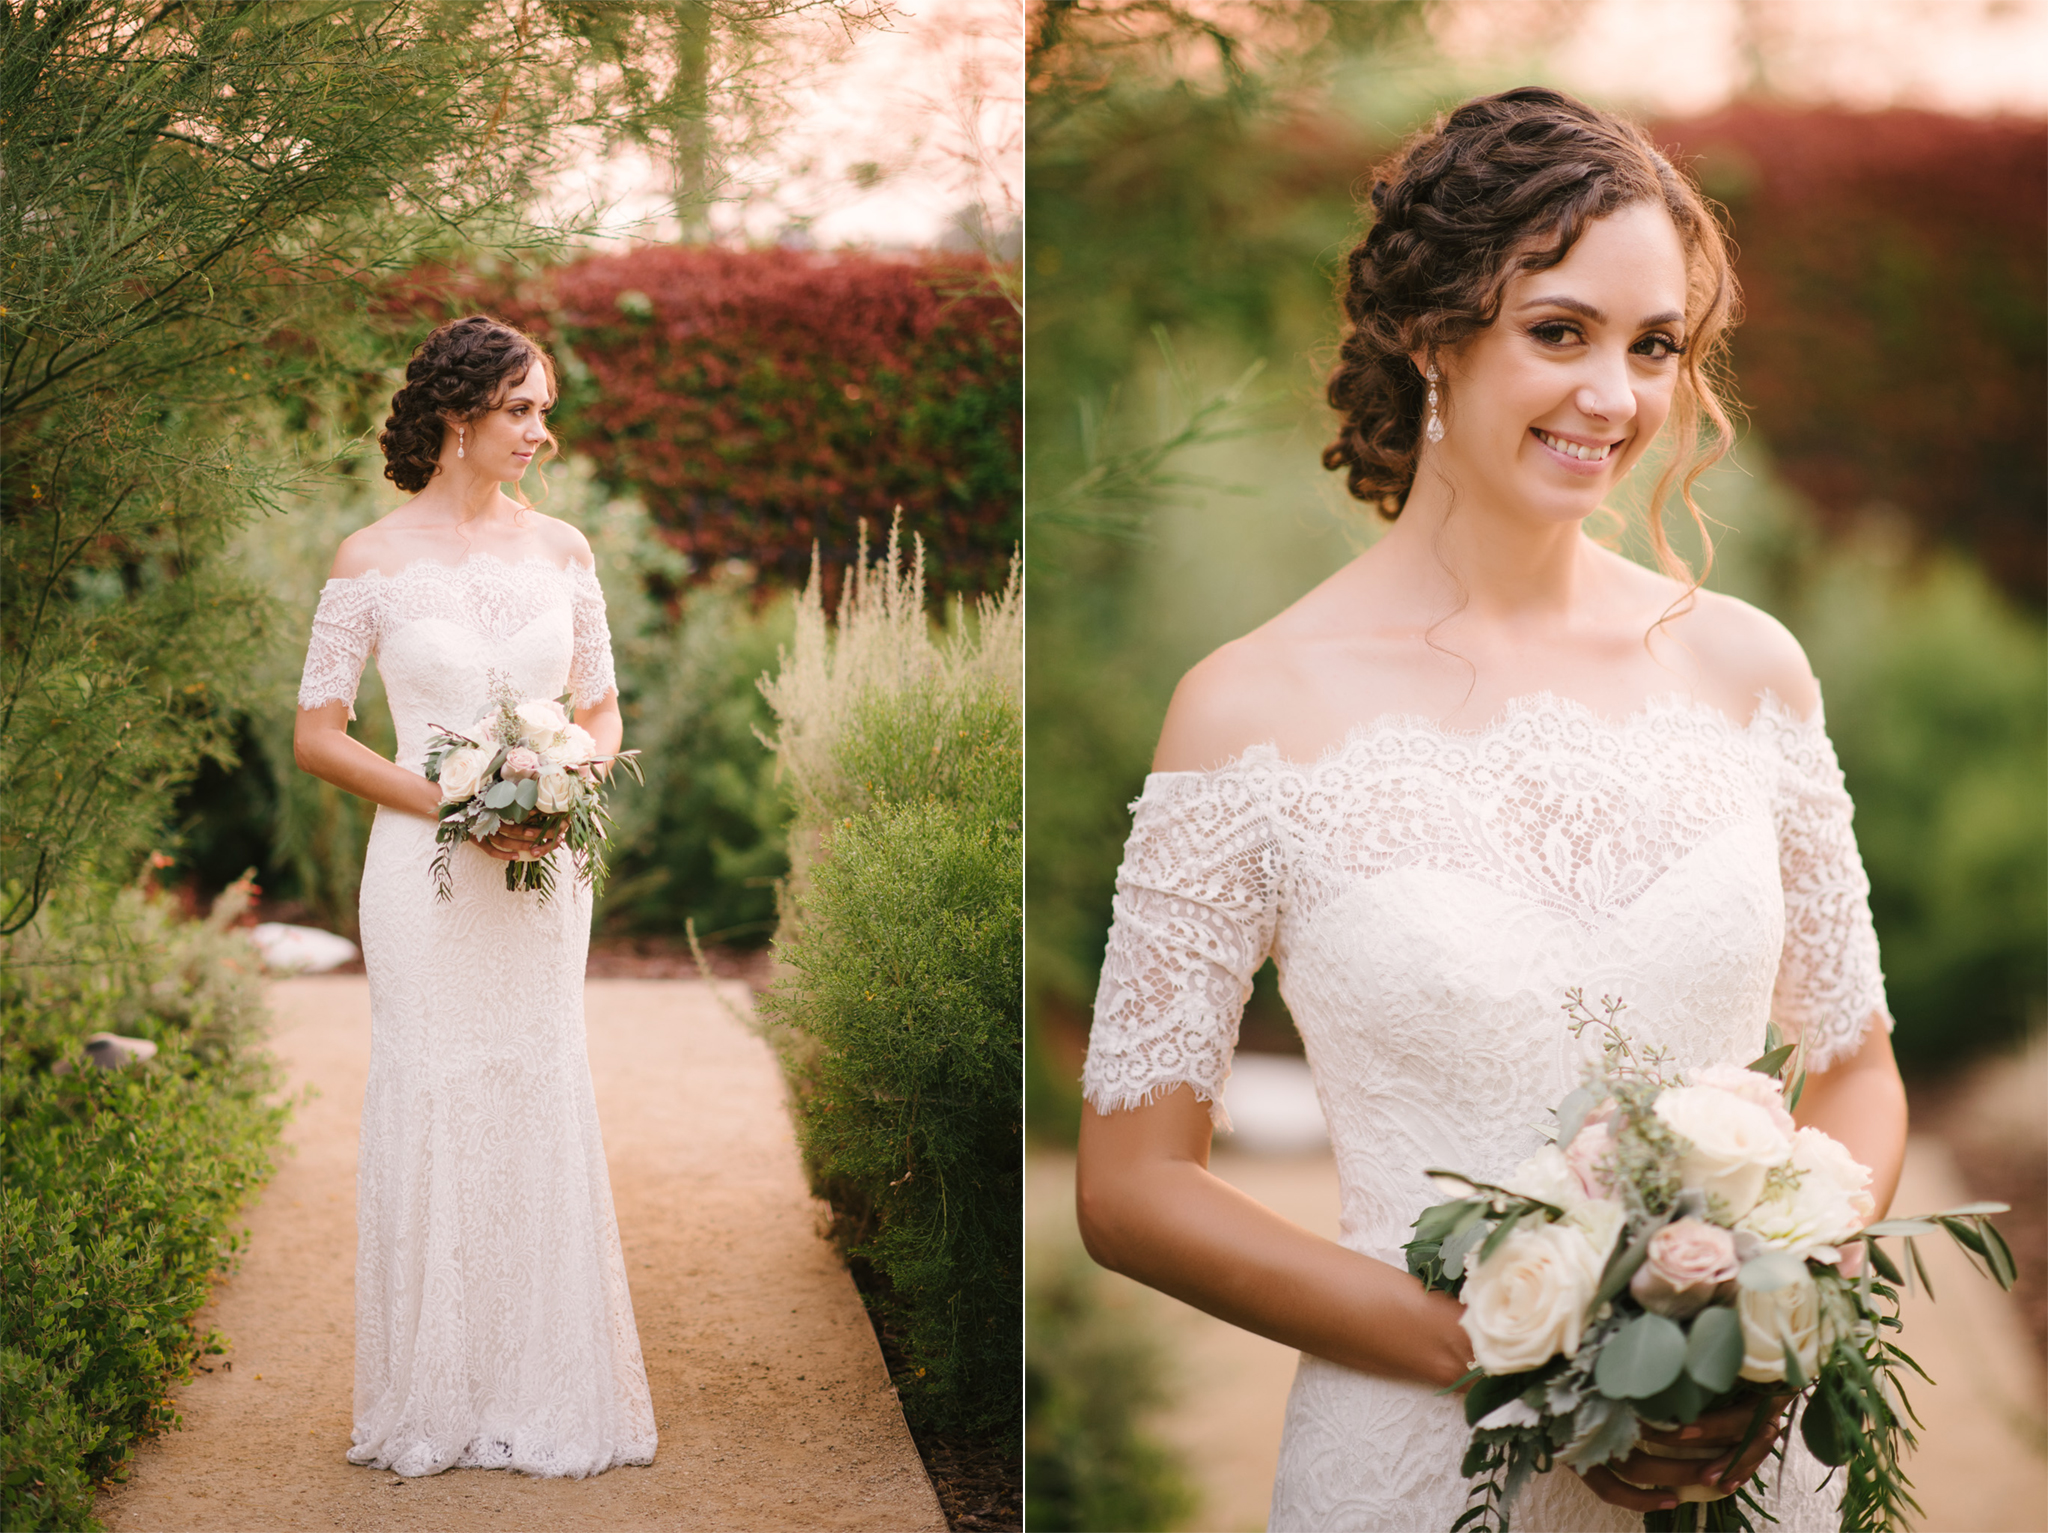 LJ-Ruby-Street-Los-Angeles-County-Wedding-Photography-15